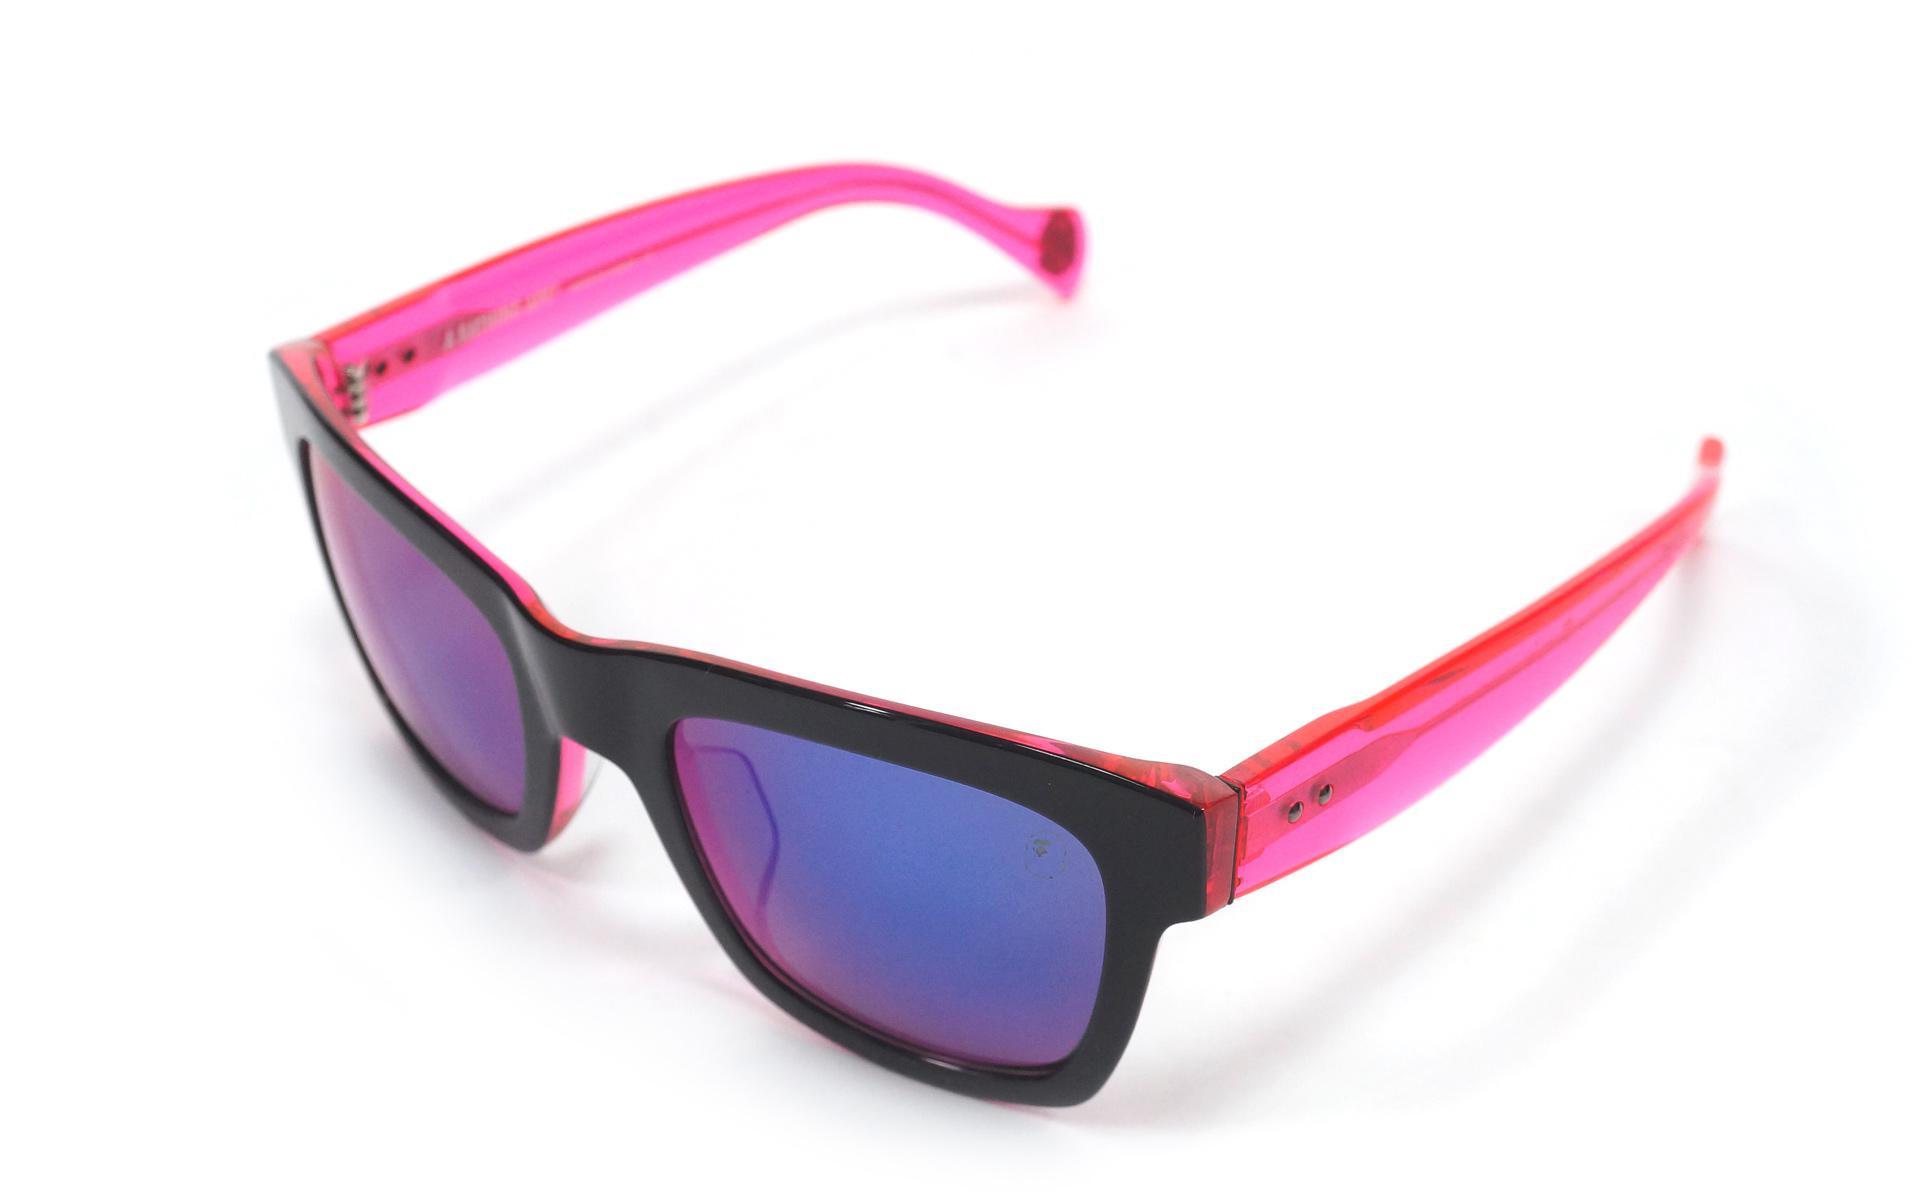 2aca54365ab Lyst - A Bathing Ape Eyewear Sunglasses 07 Neon Pink in Pink for Men